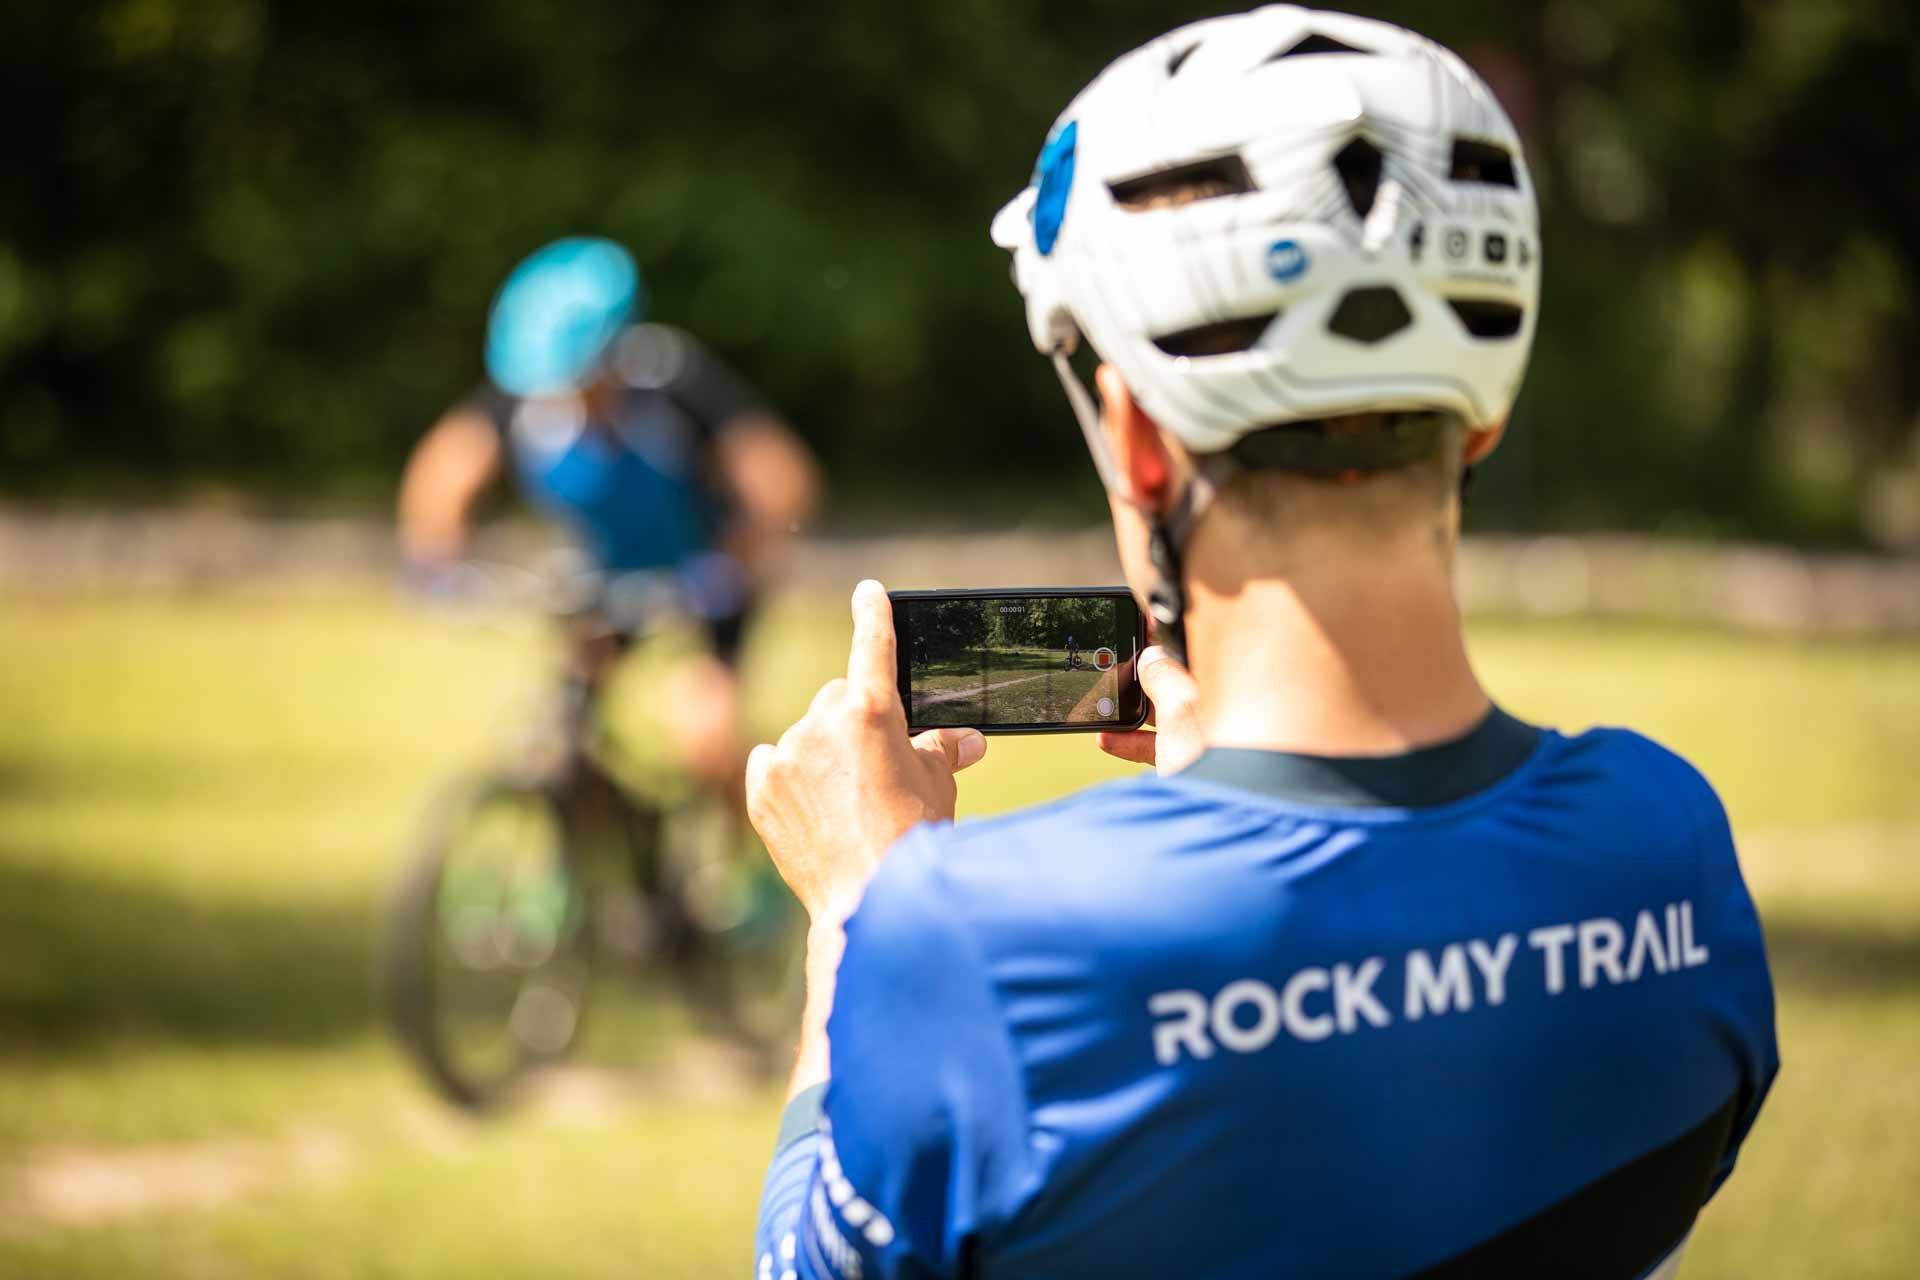 eMTB eBike Fortgeschritten Fahrtechnik Kurs in Siegen - Rock my Trail Bikeschule320